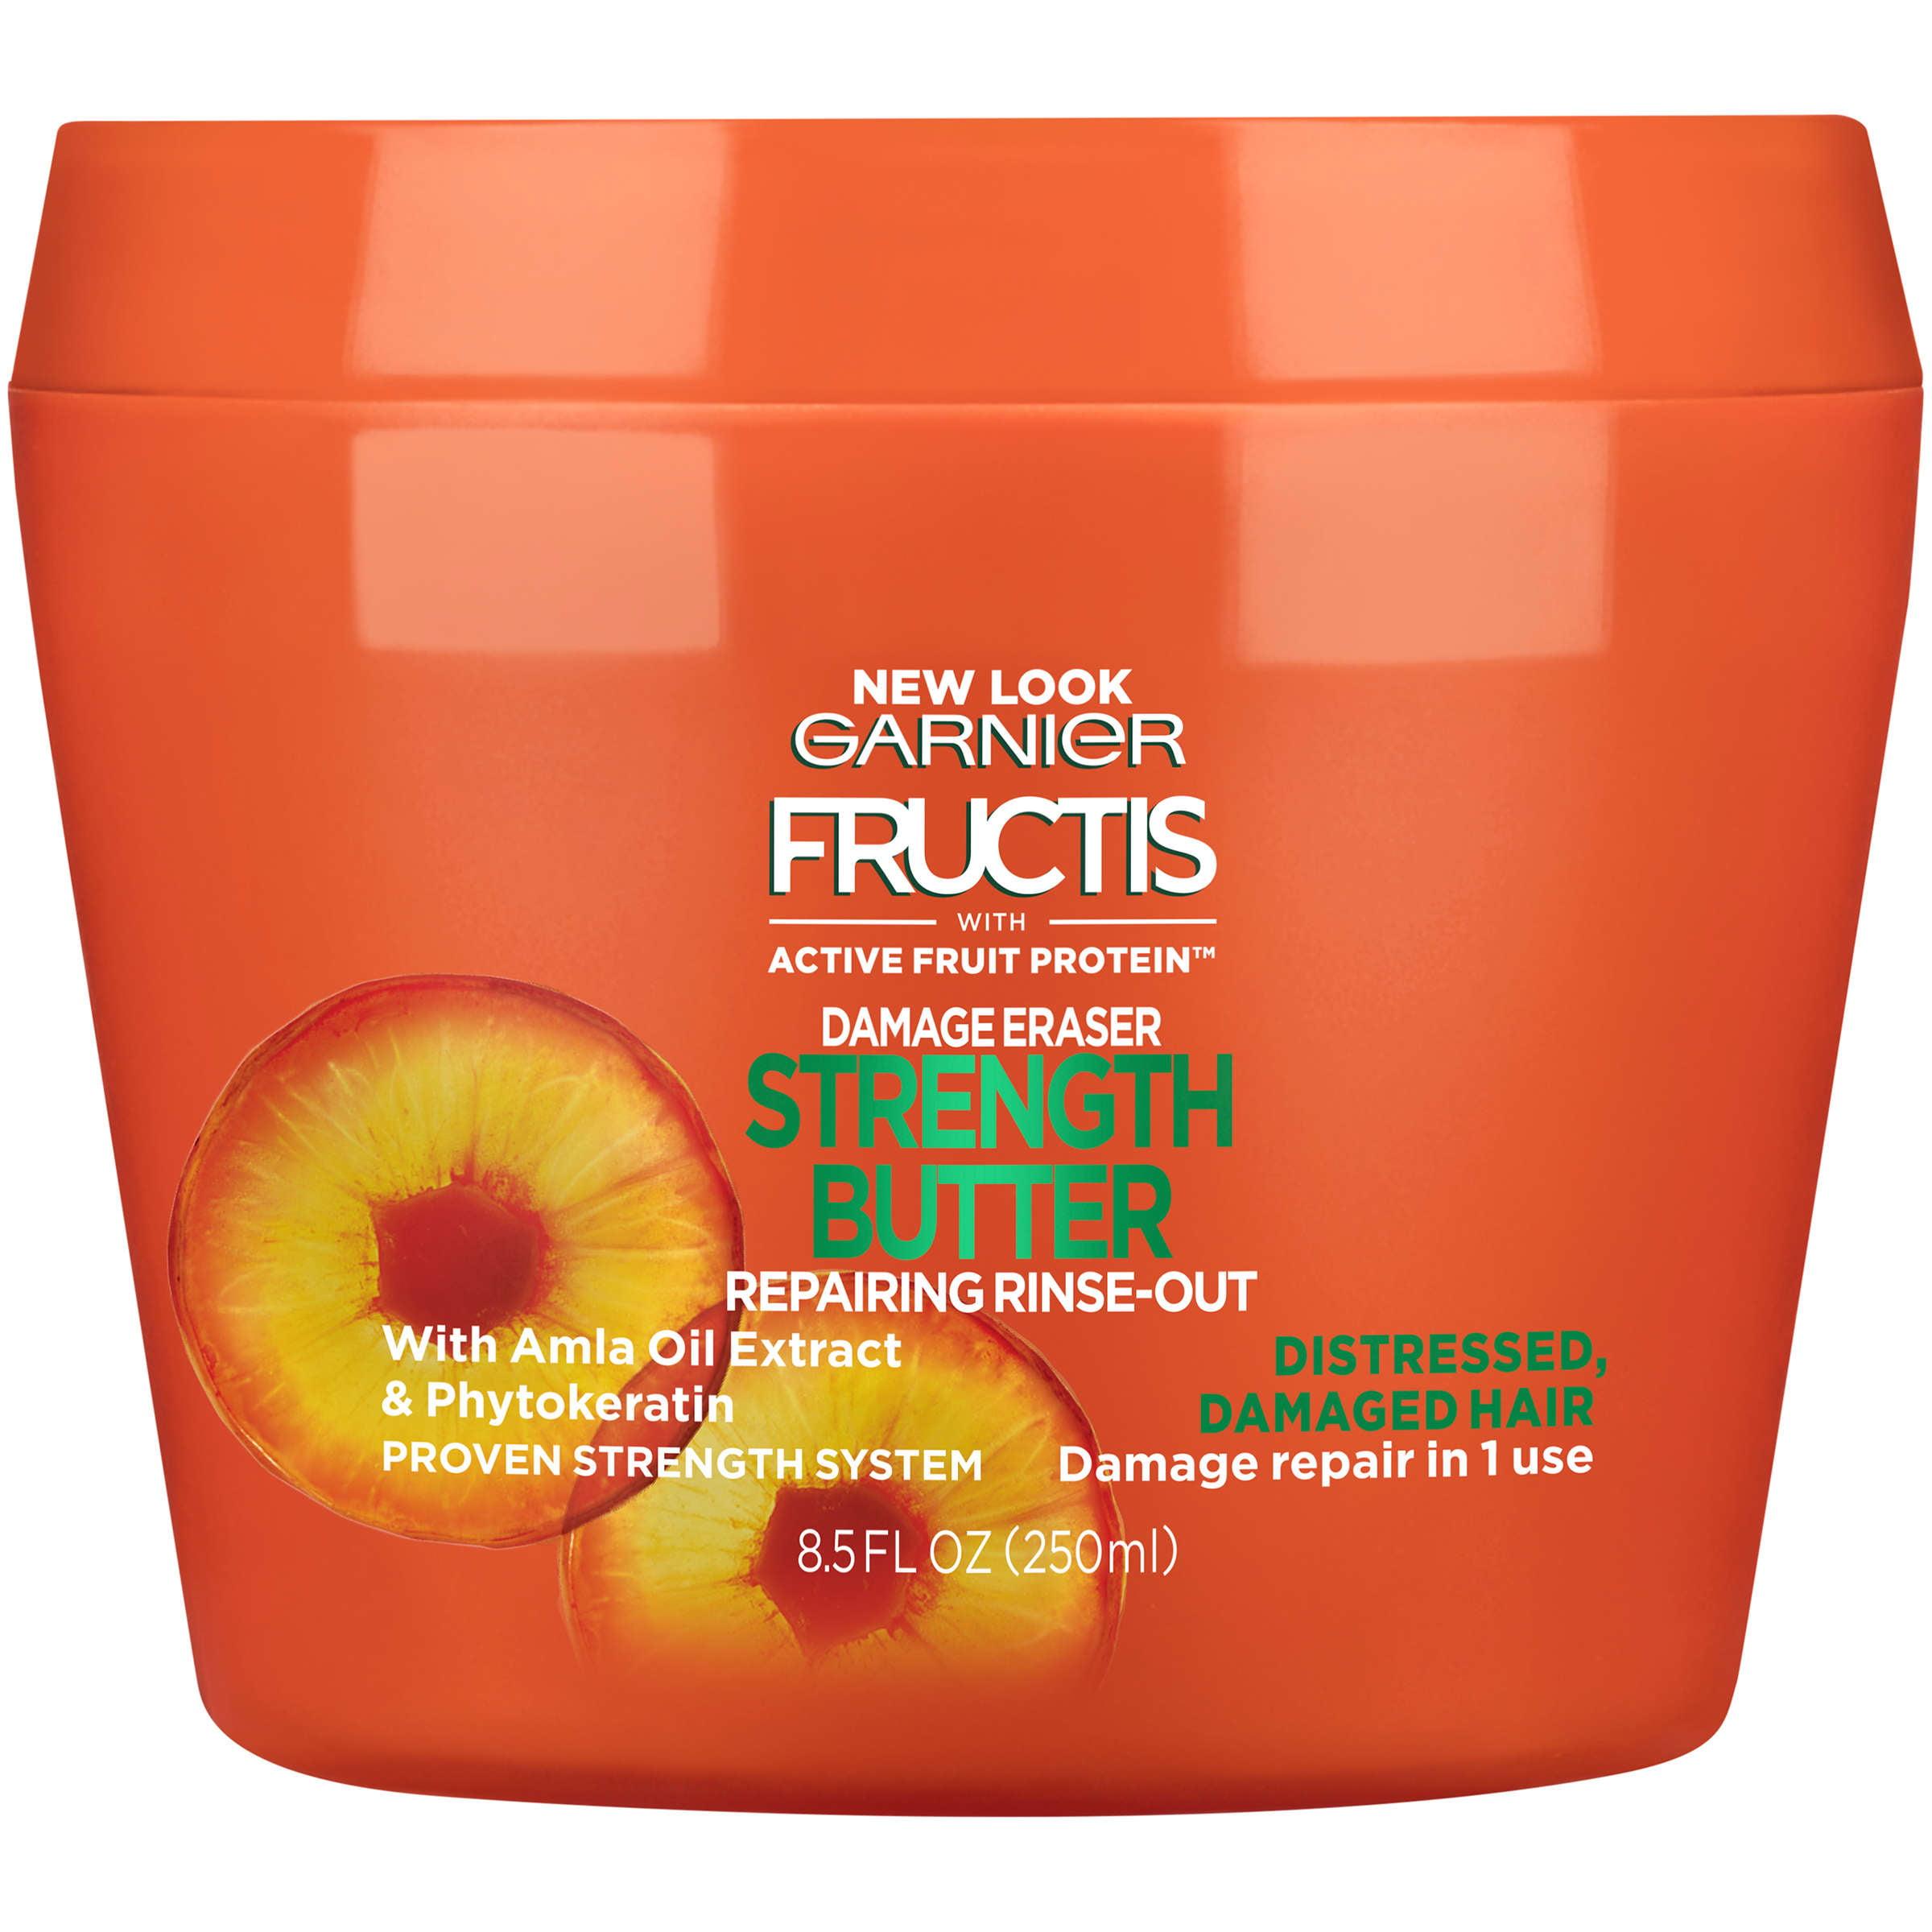 Fructis Damage Eraser Strength Reconstructing Butter Hair Mask For Distressed, Damaged Hair, 8.5 fl oz